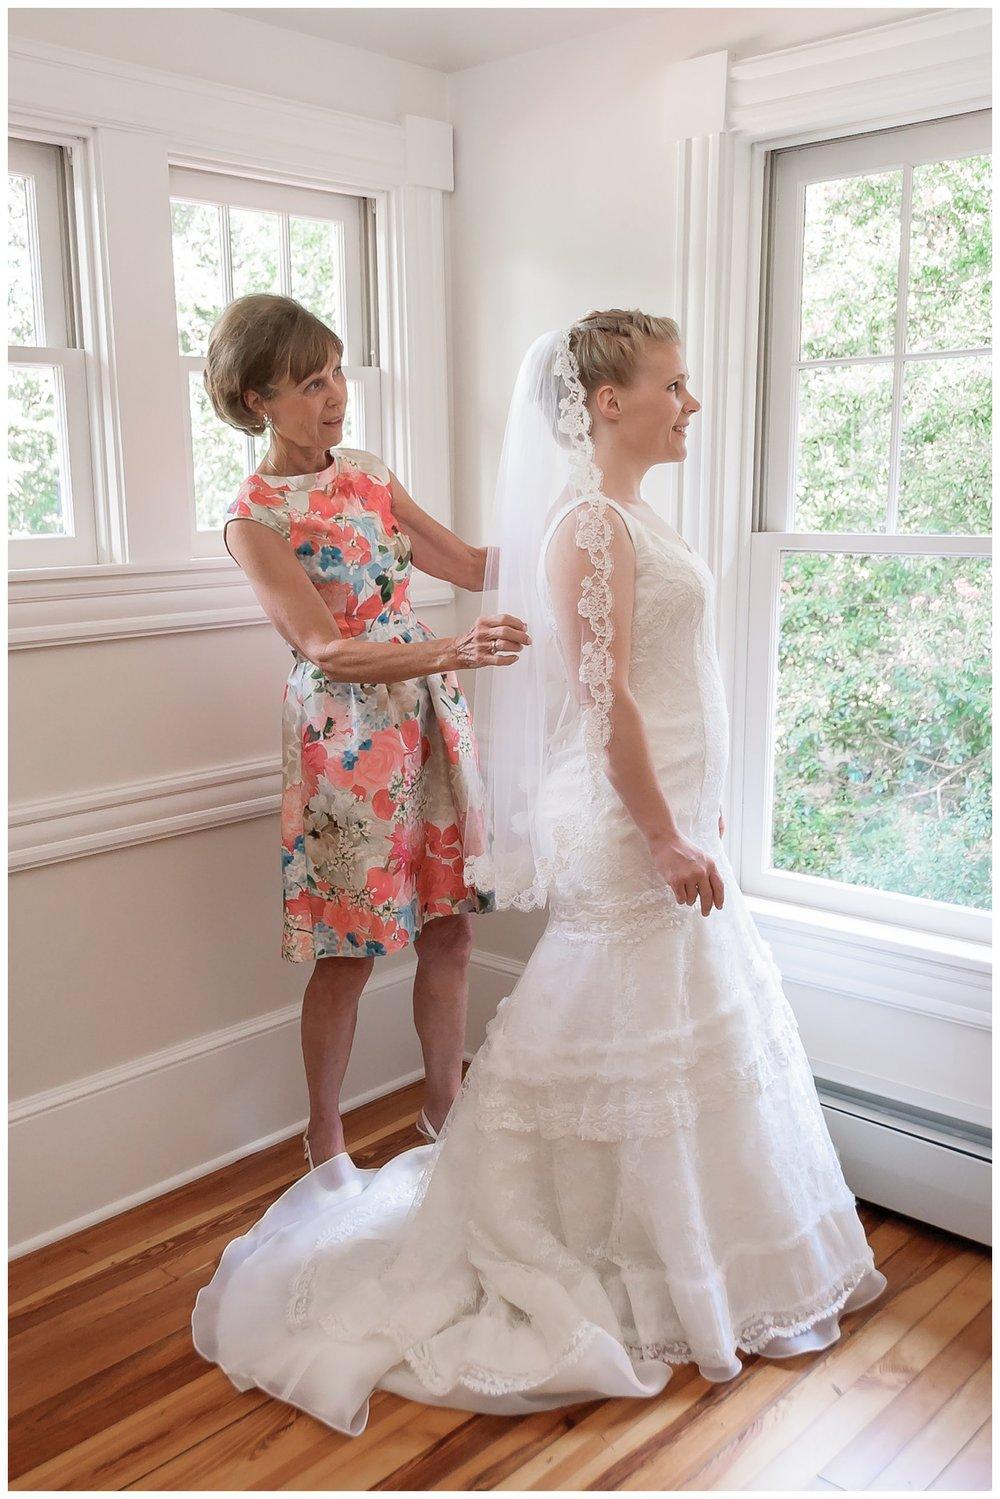 Della and Andrew Wedding Photos_Hendry House Arlington Virginia_Stephanie Kopf Photography_Northern Virginia Wedding Photography-42.jpg